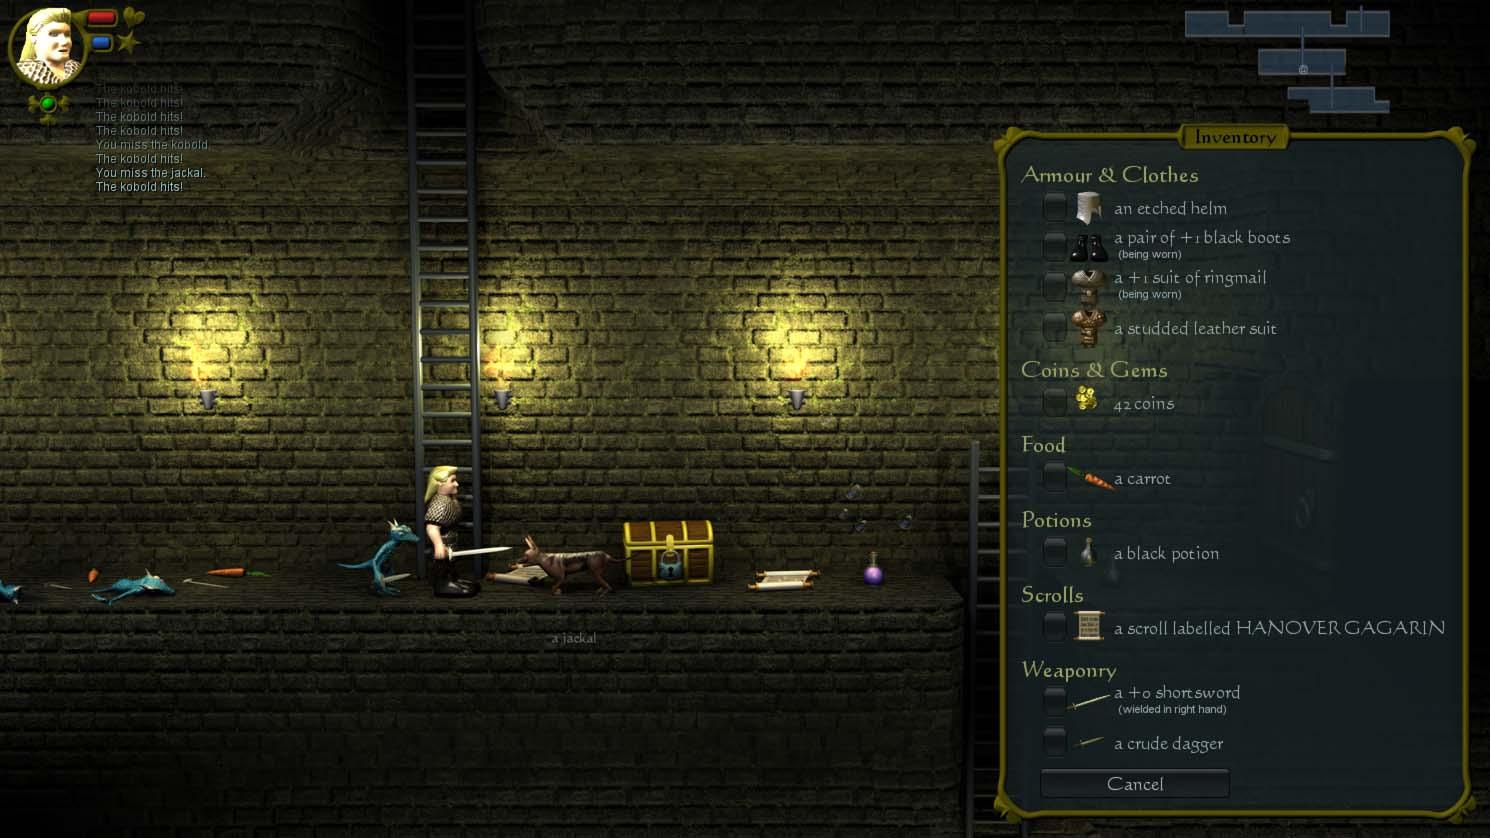 wh-screenshot-2.jpg